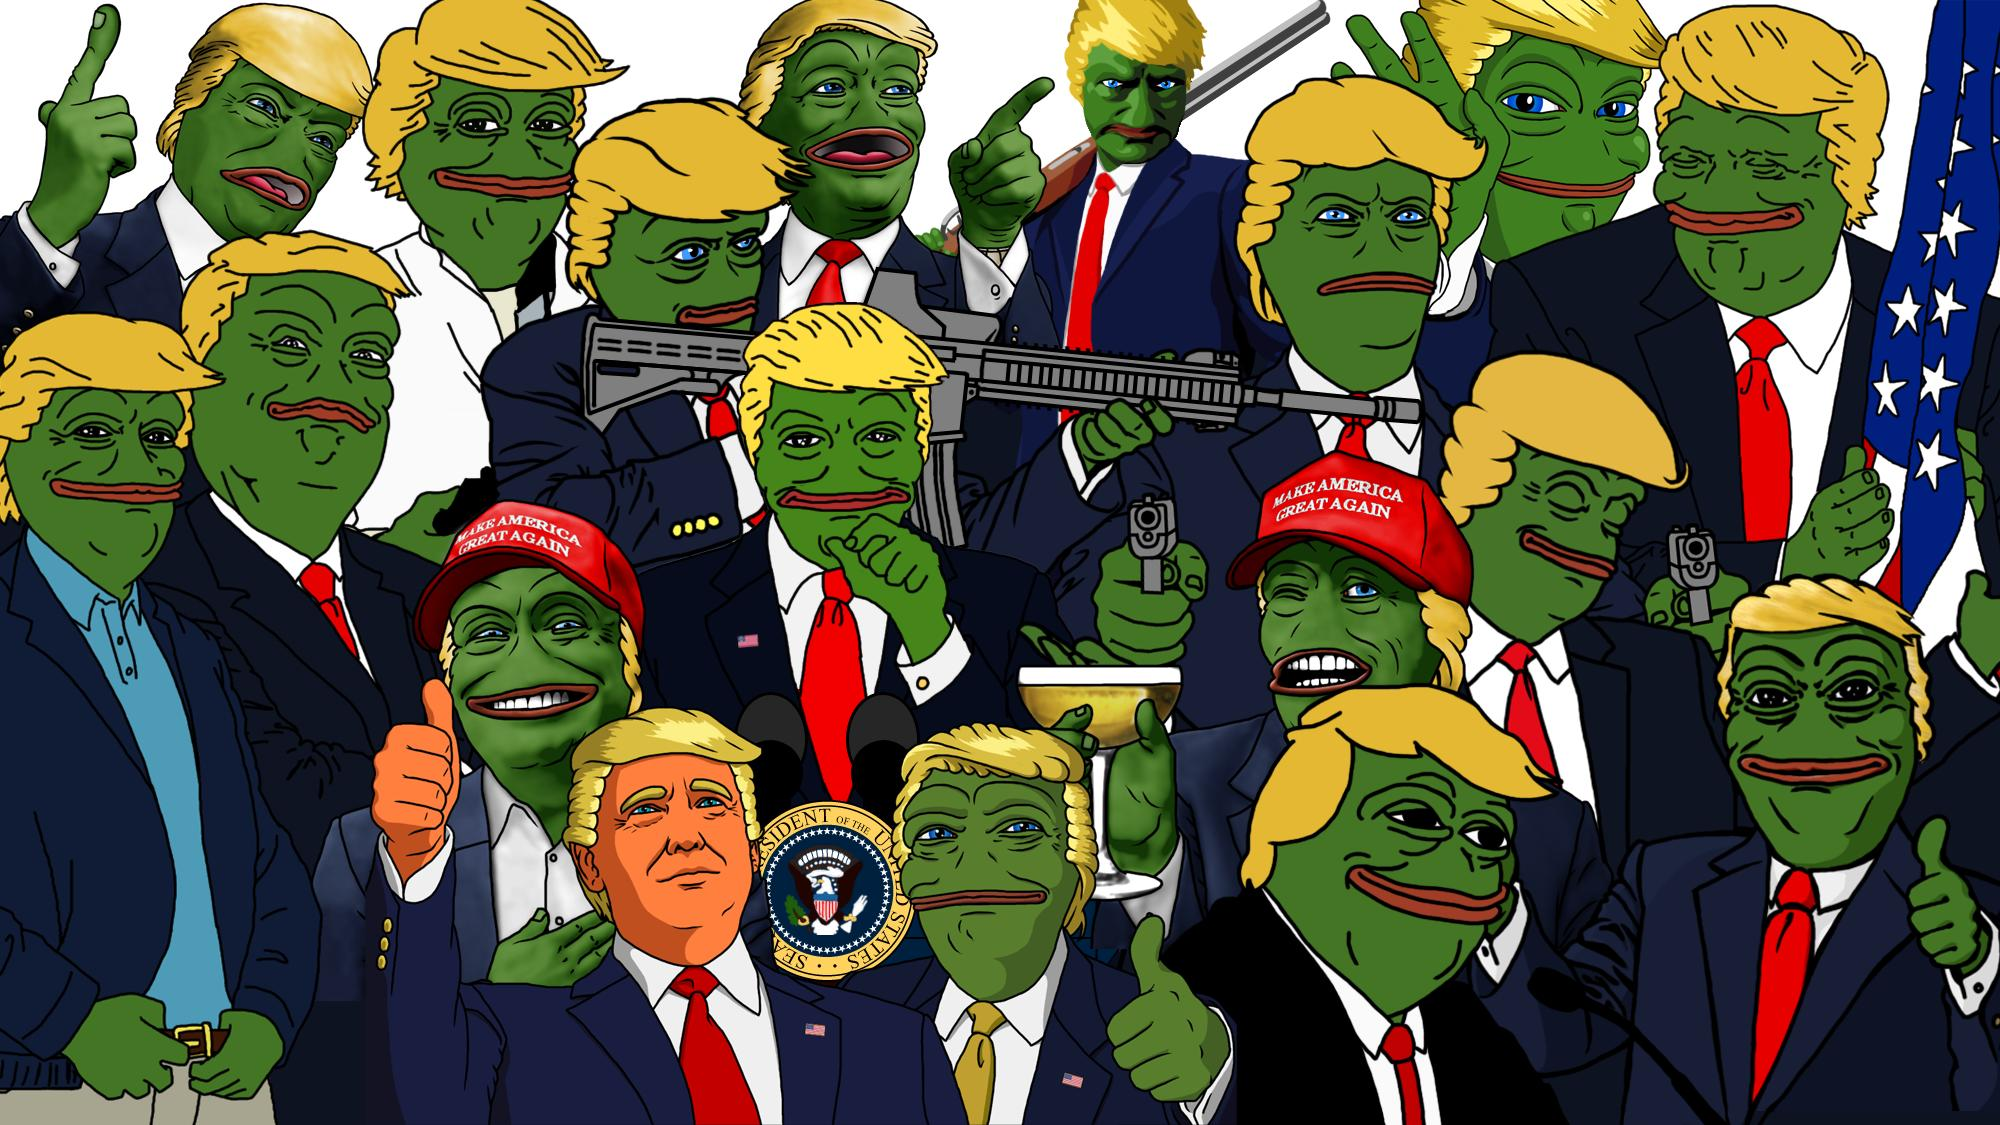 pepe collage meme